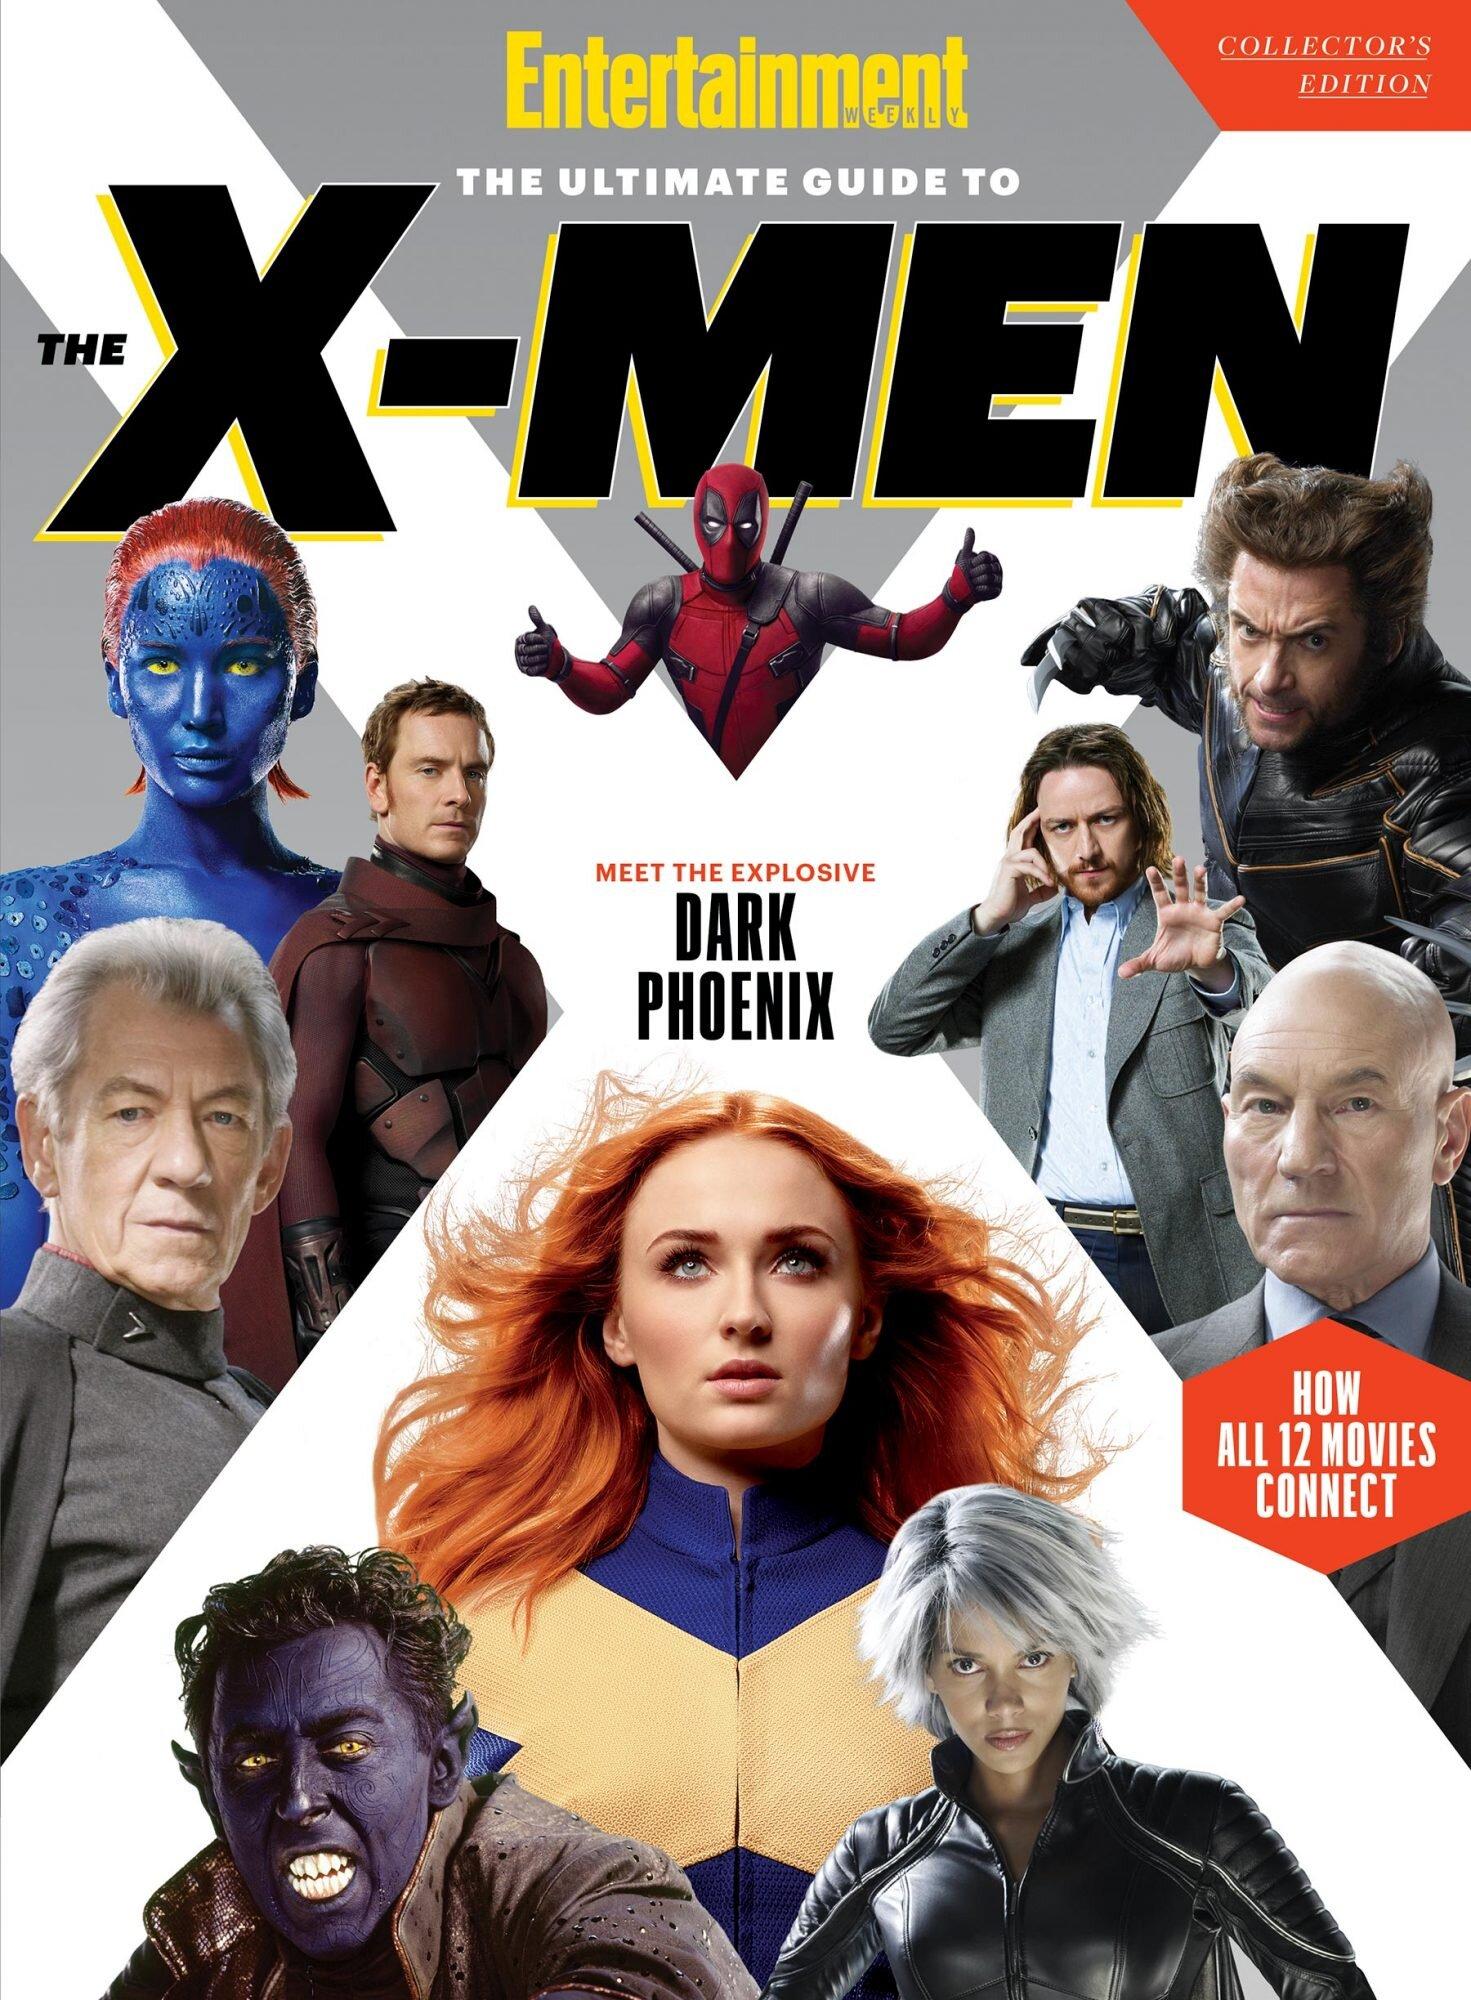 Prep for Dark Phoenix with EW's X-Men collector's edition | EW.com